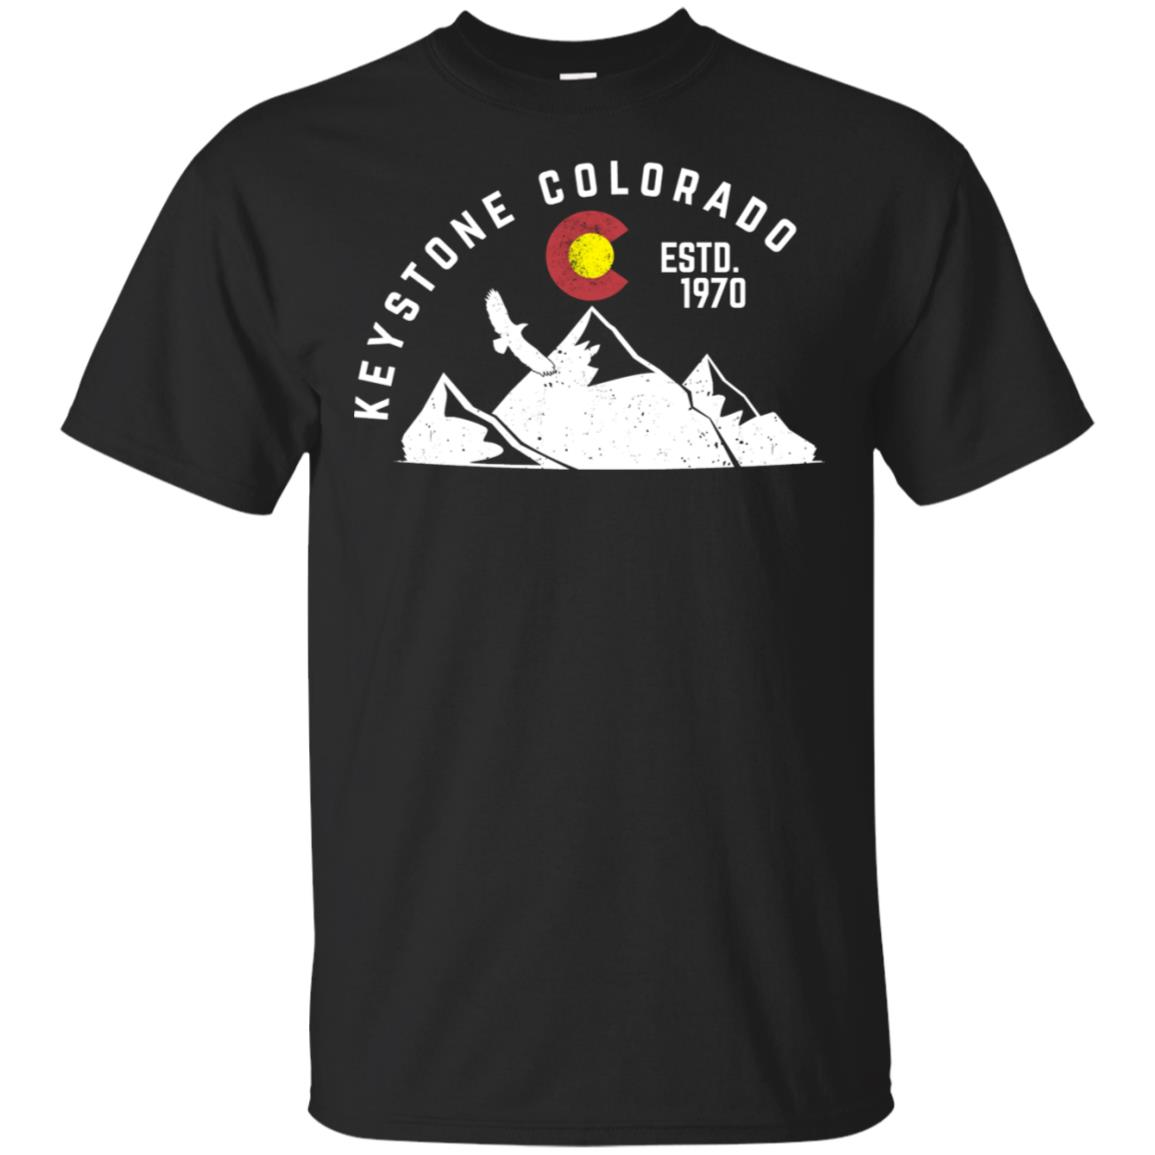 Keystone Colorado Estd 1970 Vintage Unisex Short Sleeve